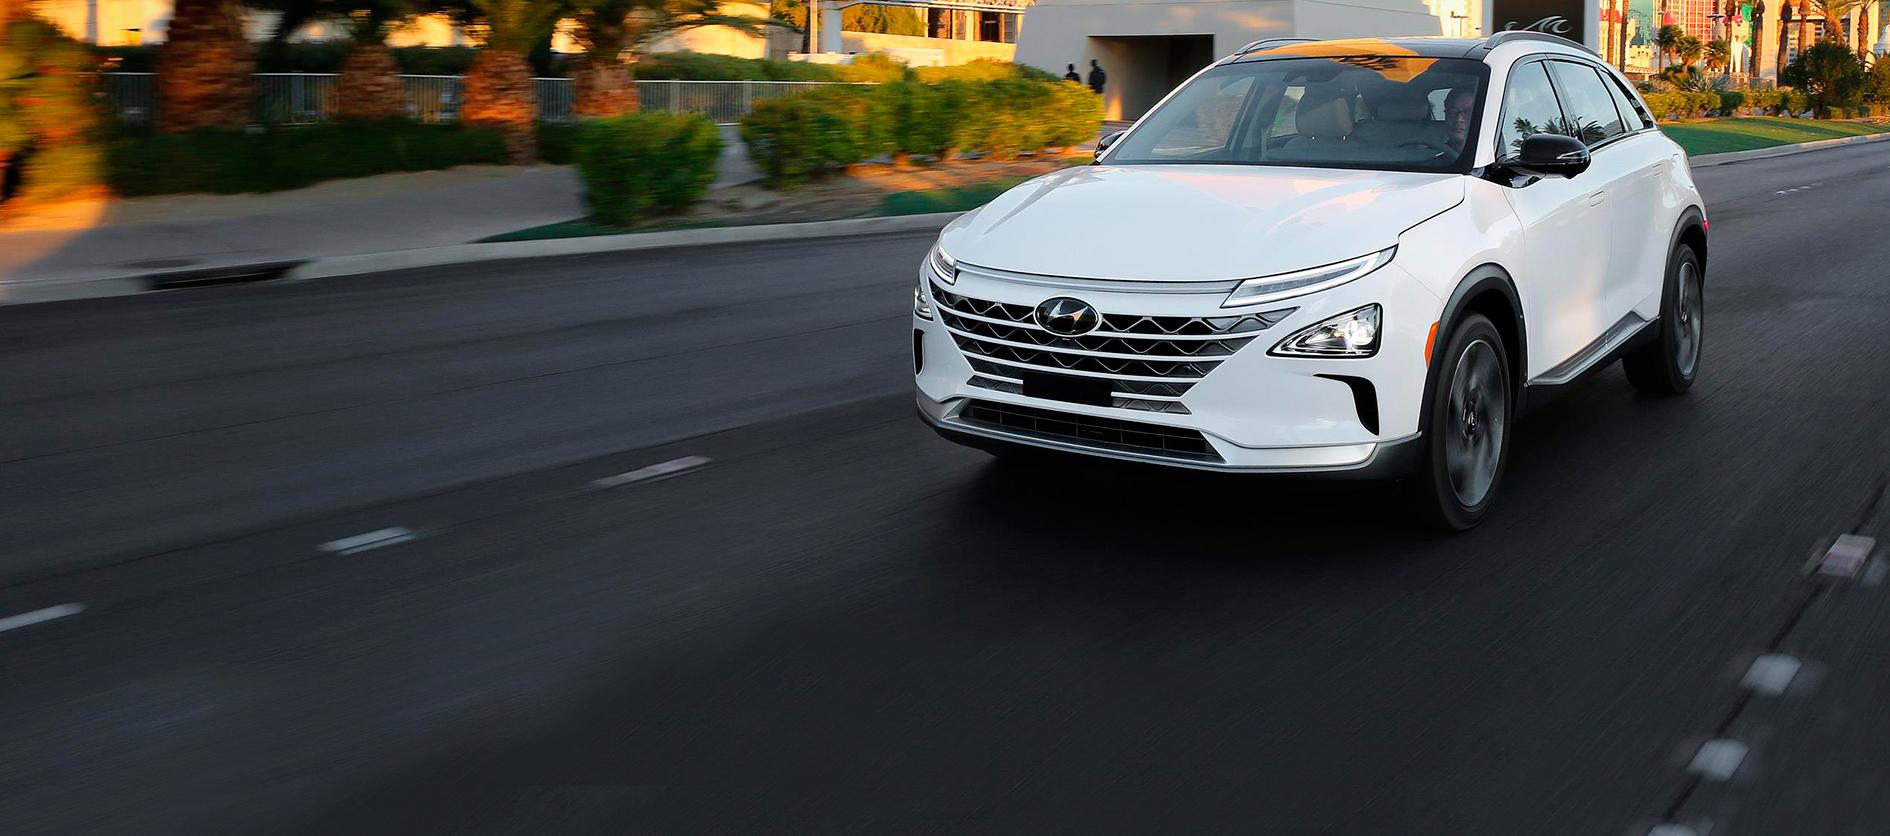 Hyundai NEXO,primer FCEV matriculado en nuestro país